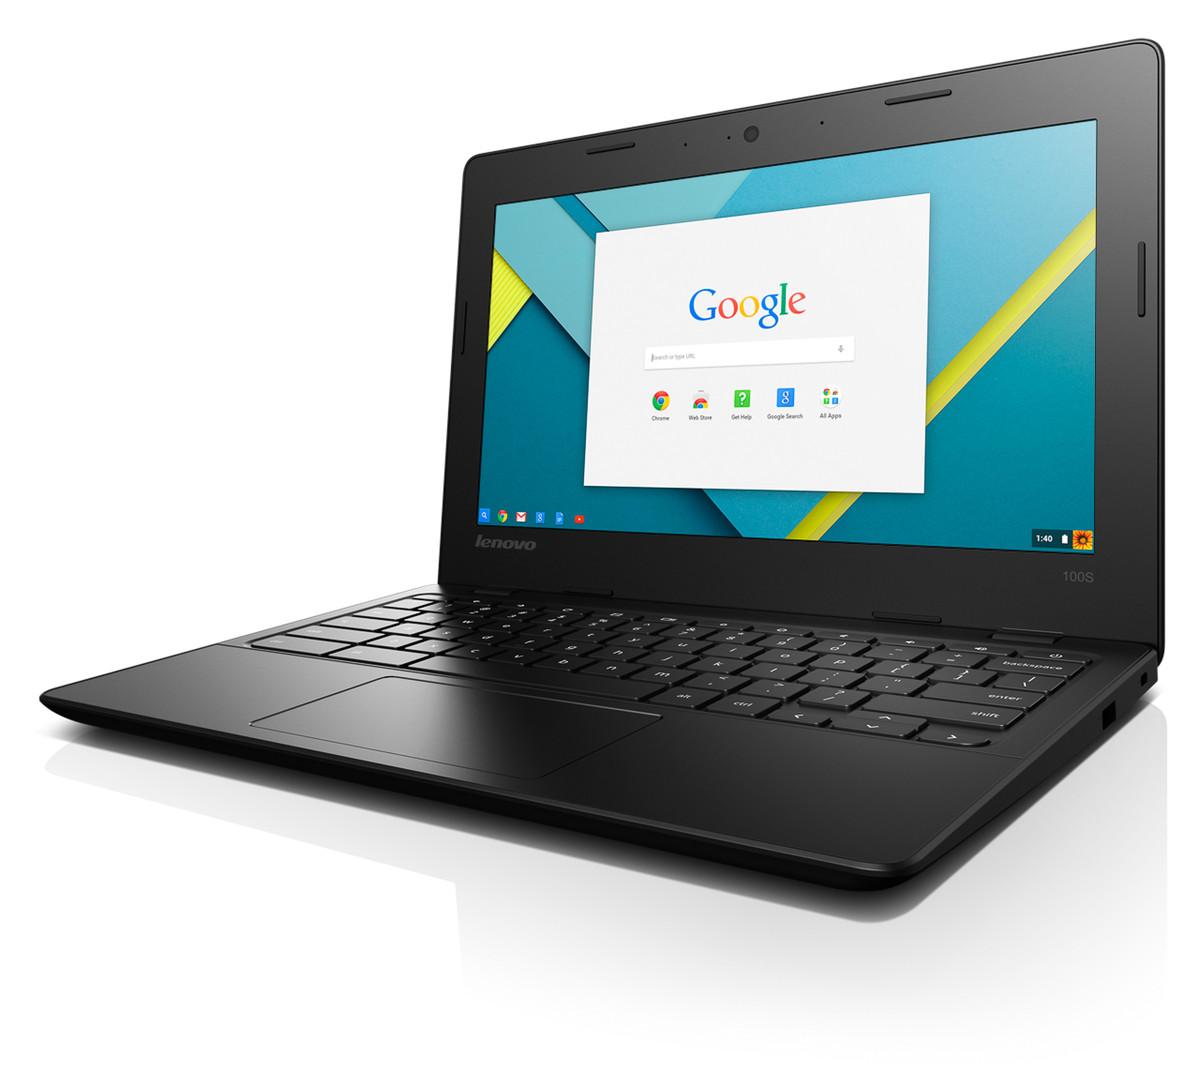 Lenovo Chromebook 100s Simple Et Autour De 150 Euros